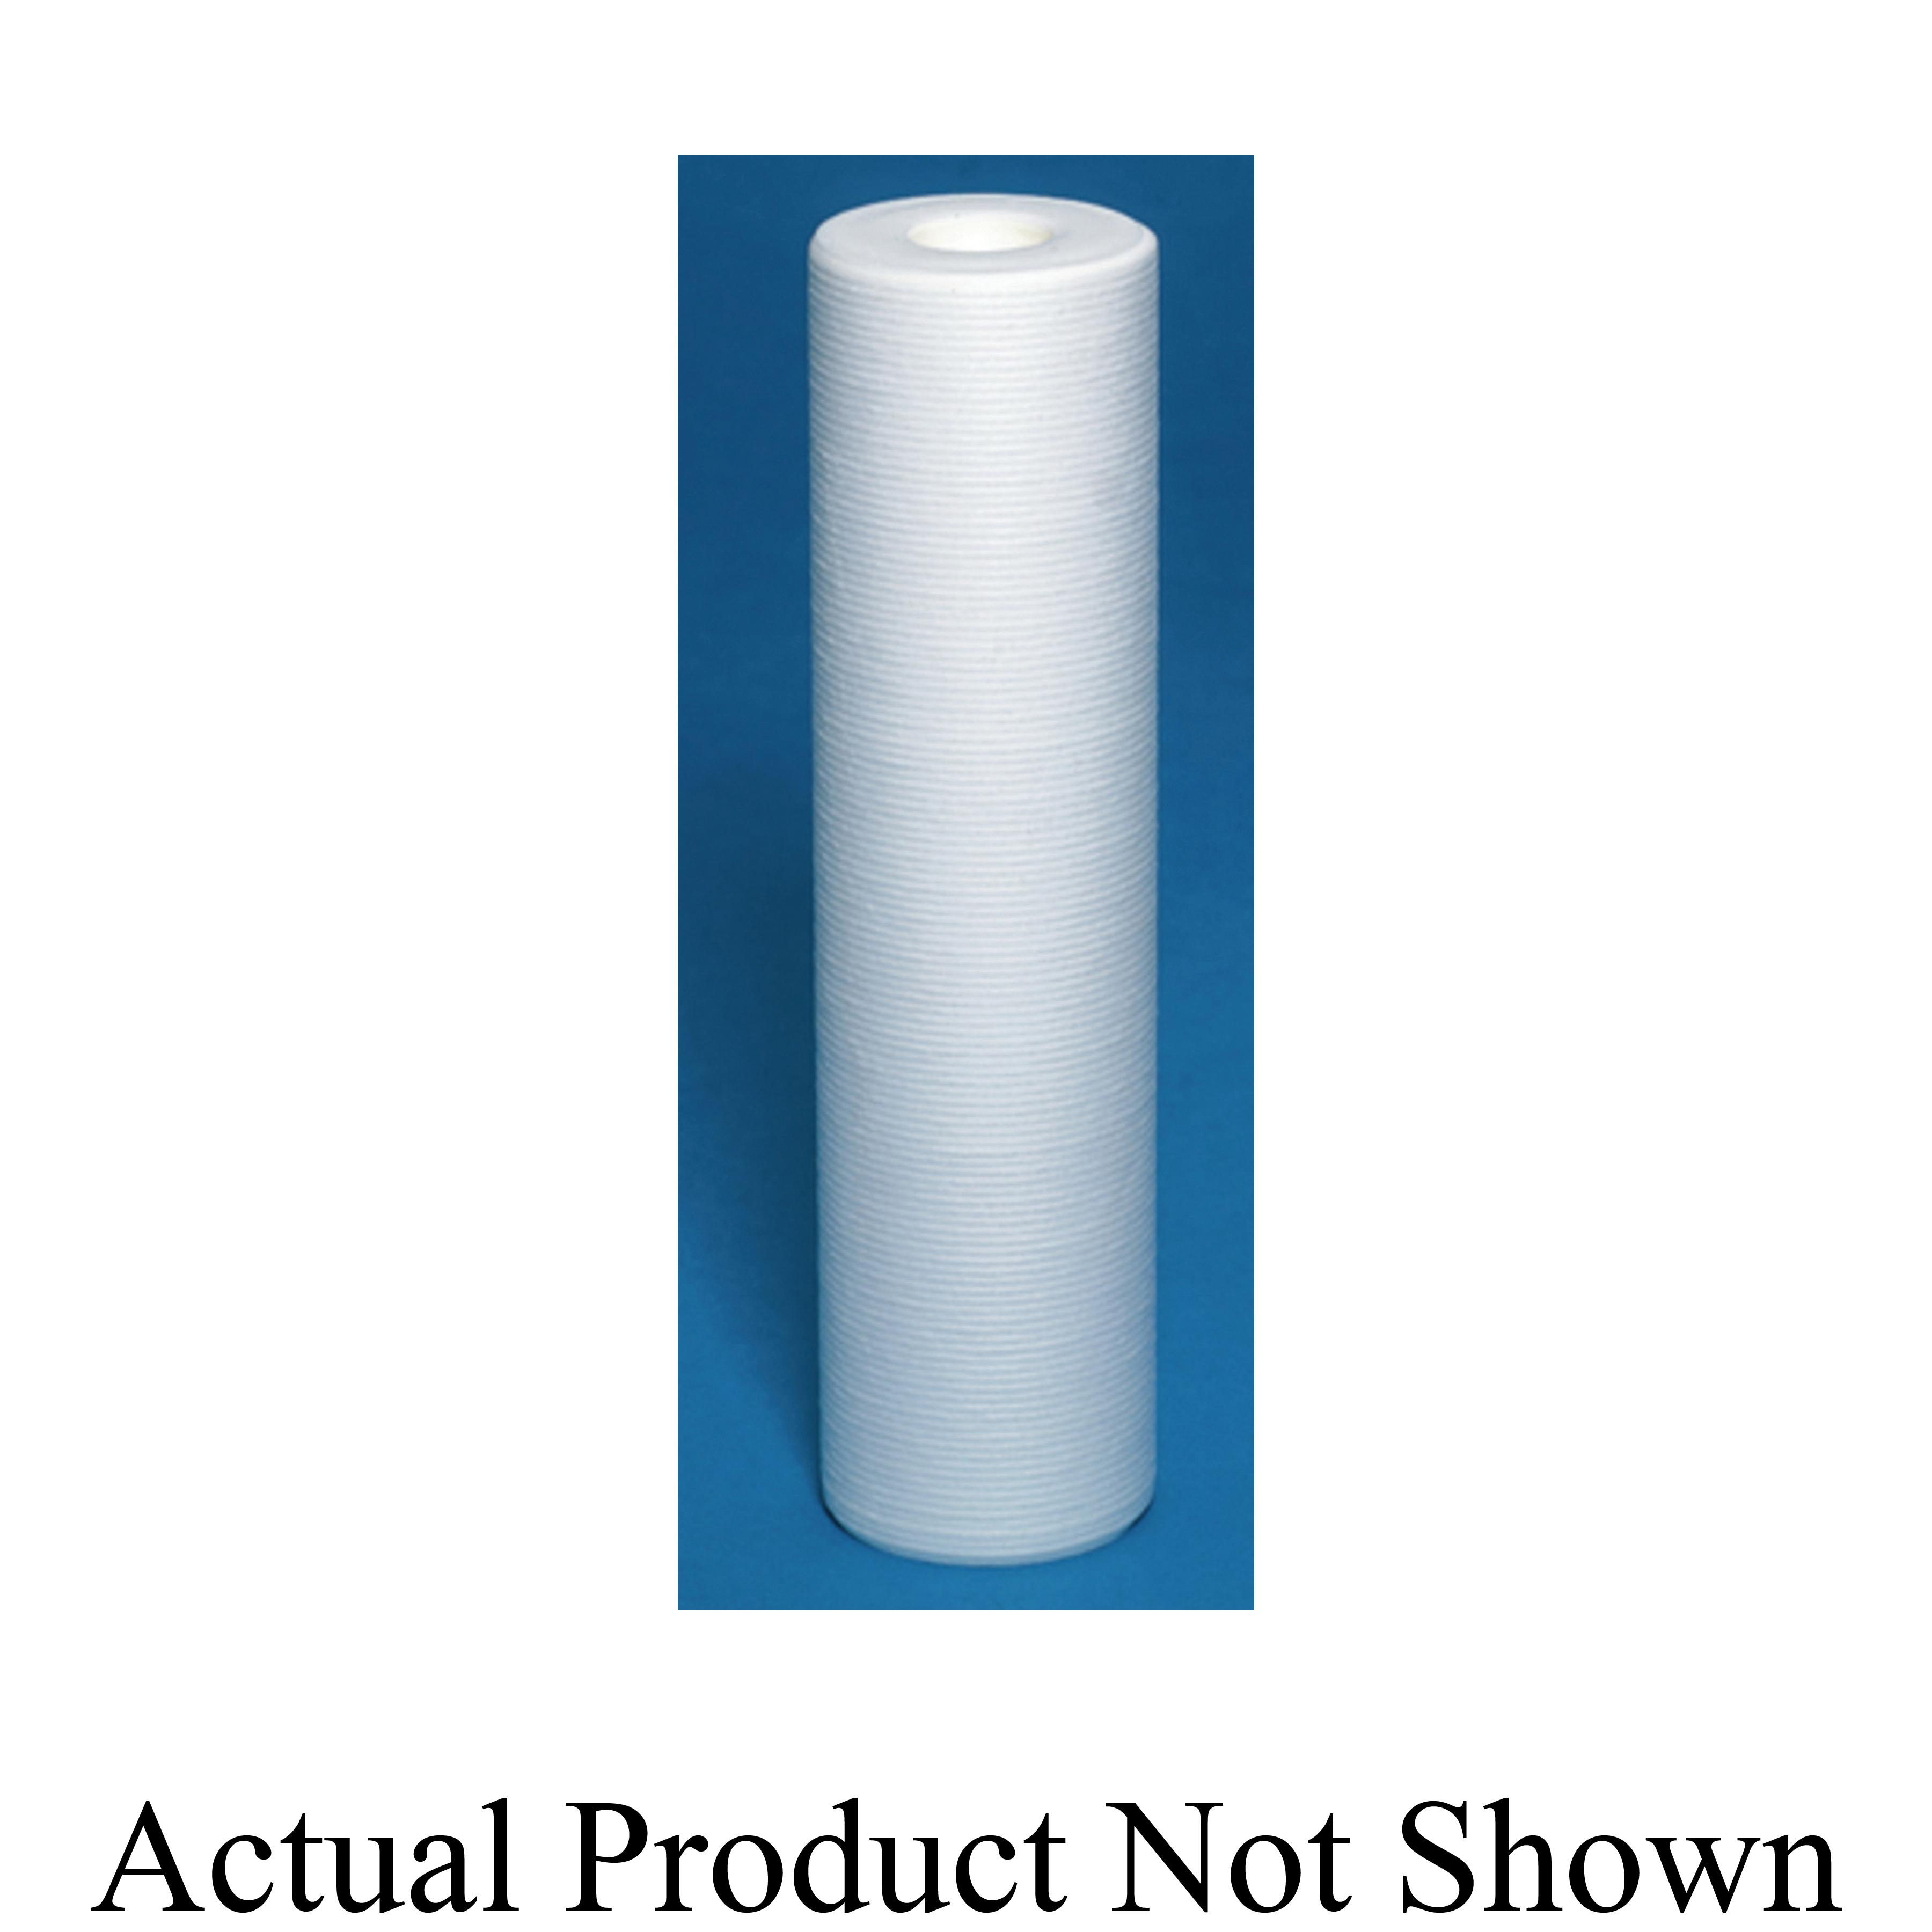 3M™ 016145-18124 NB Filter Bag, 32 in L Filter Bag, 180 gpm, 180 deg F, 100 micron